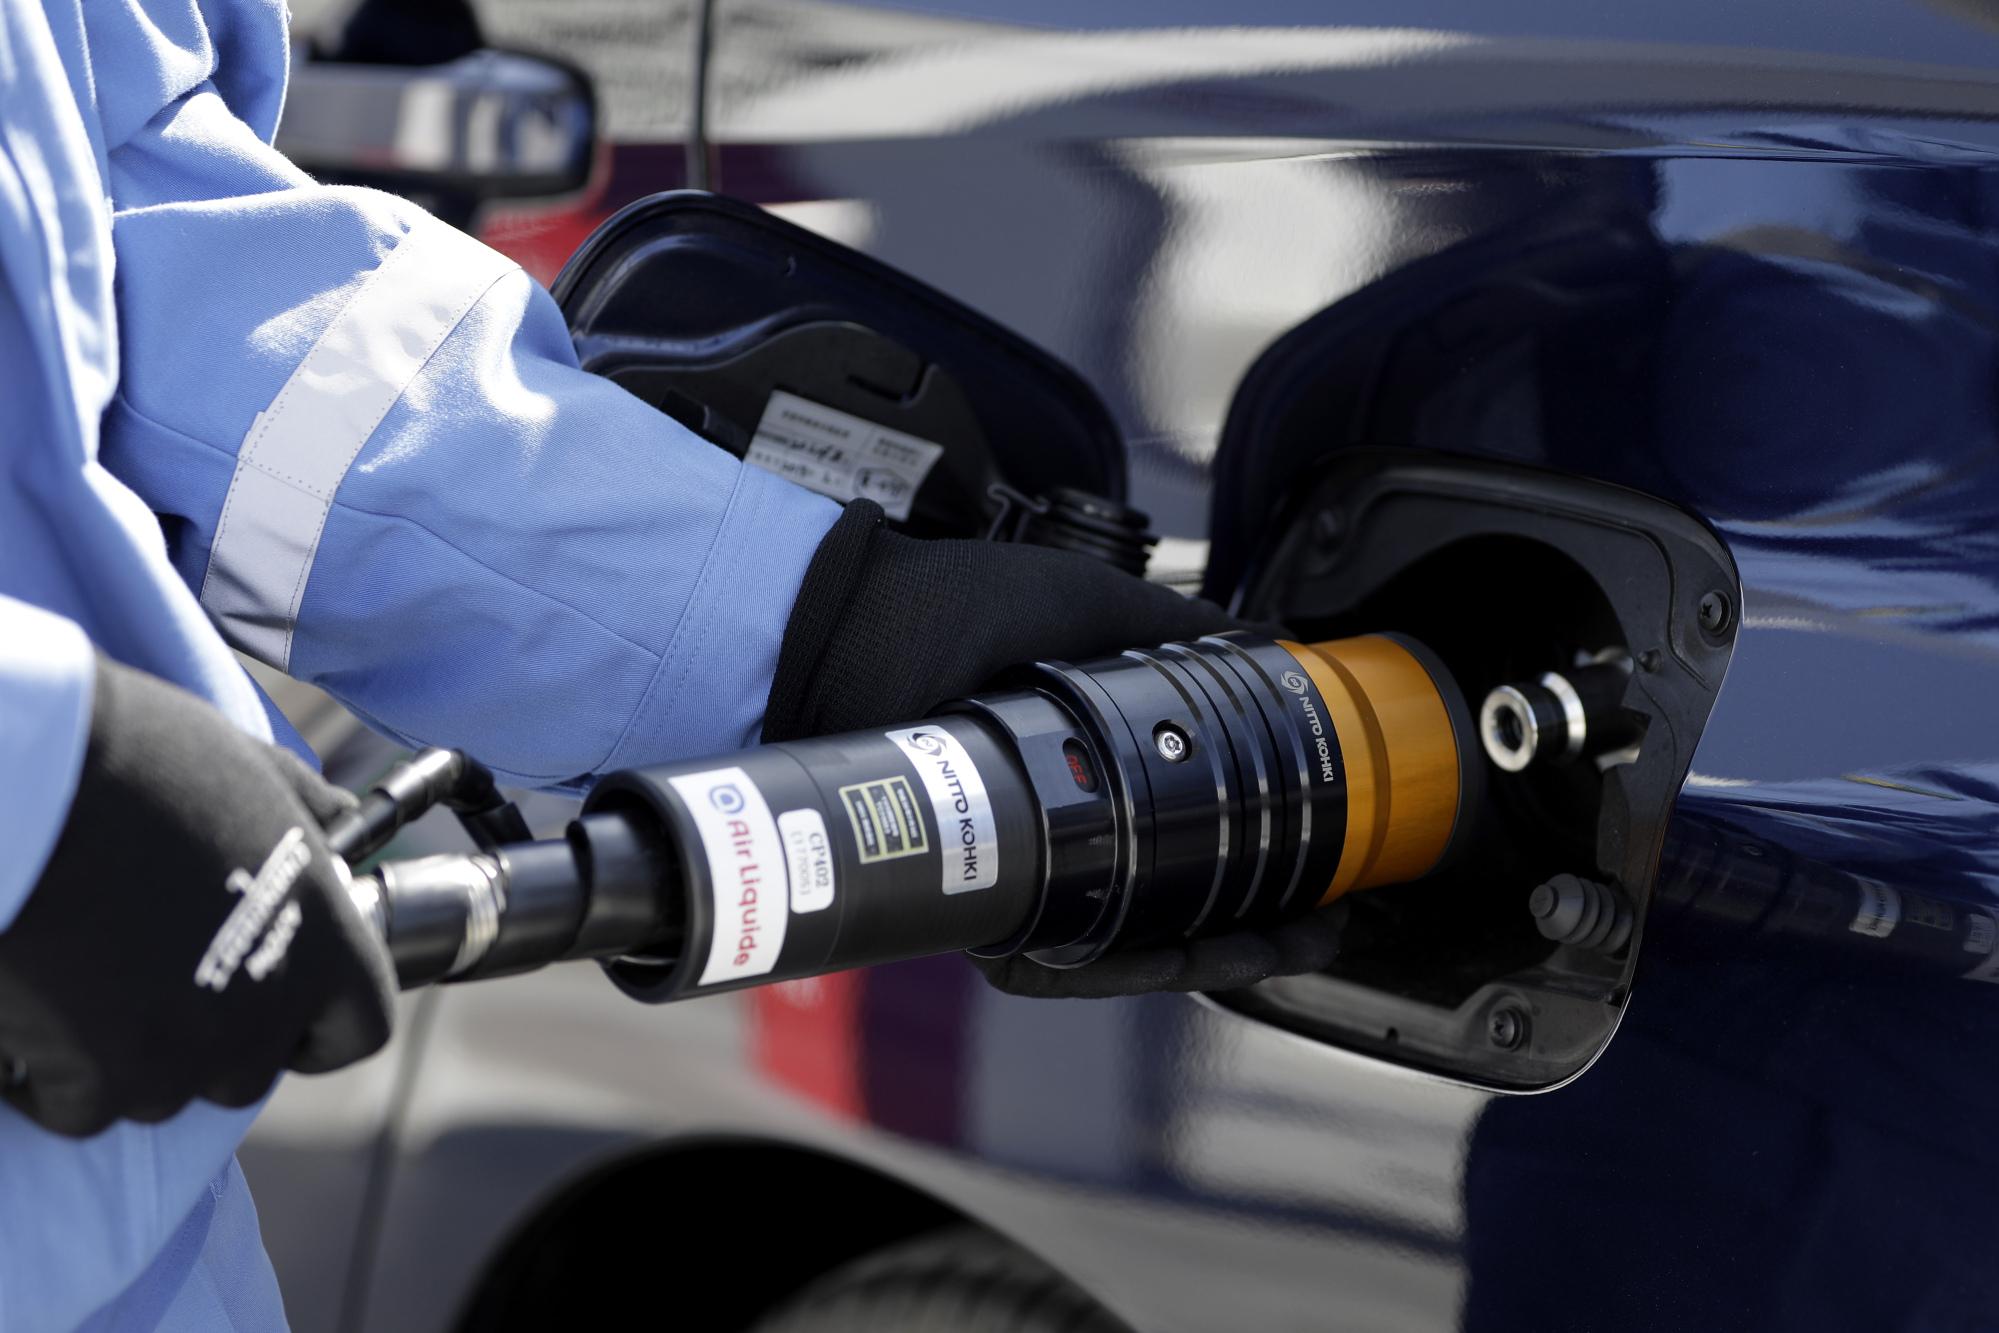 bloomberg.com - Adam Minter - China's Hydrogen Economy Is Coming